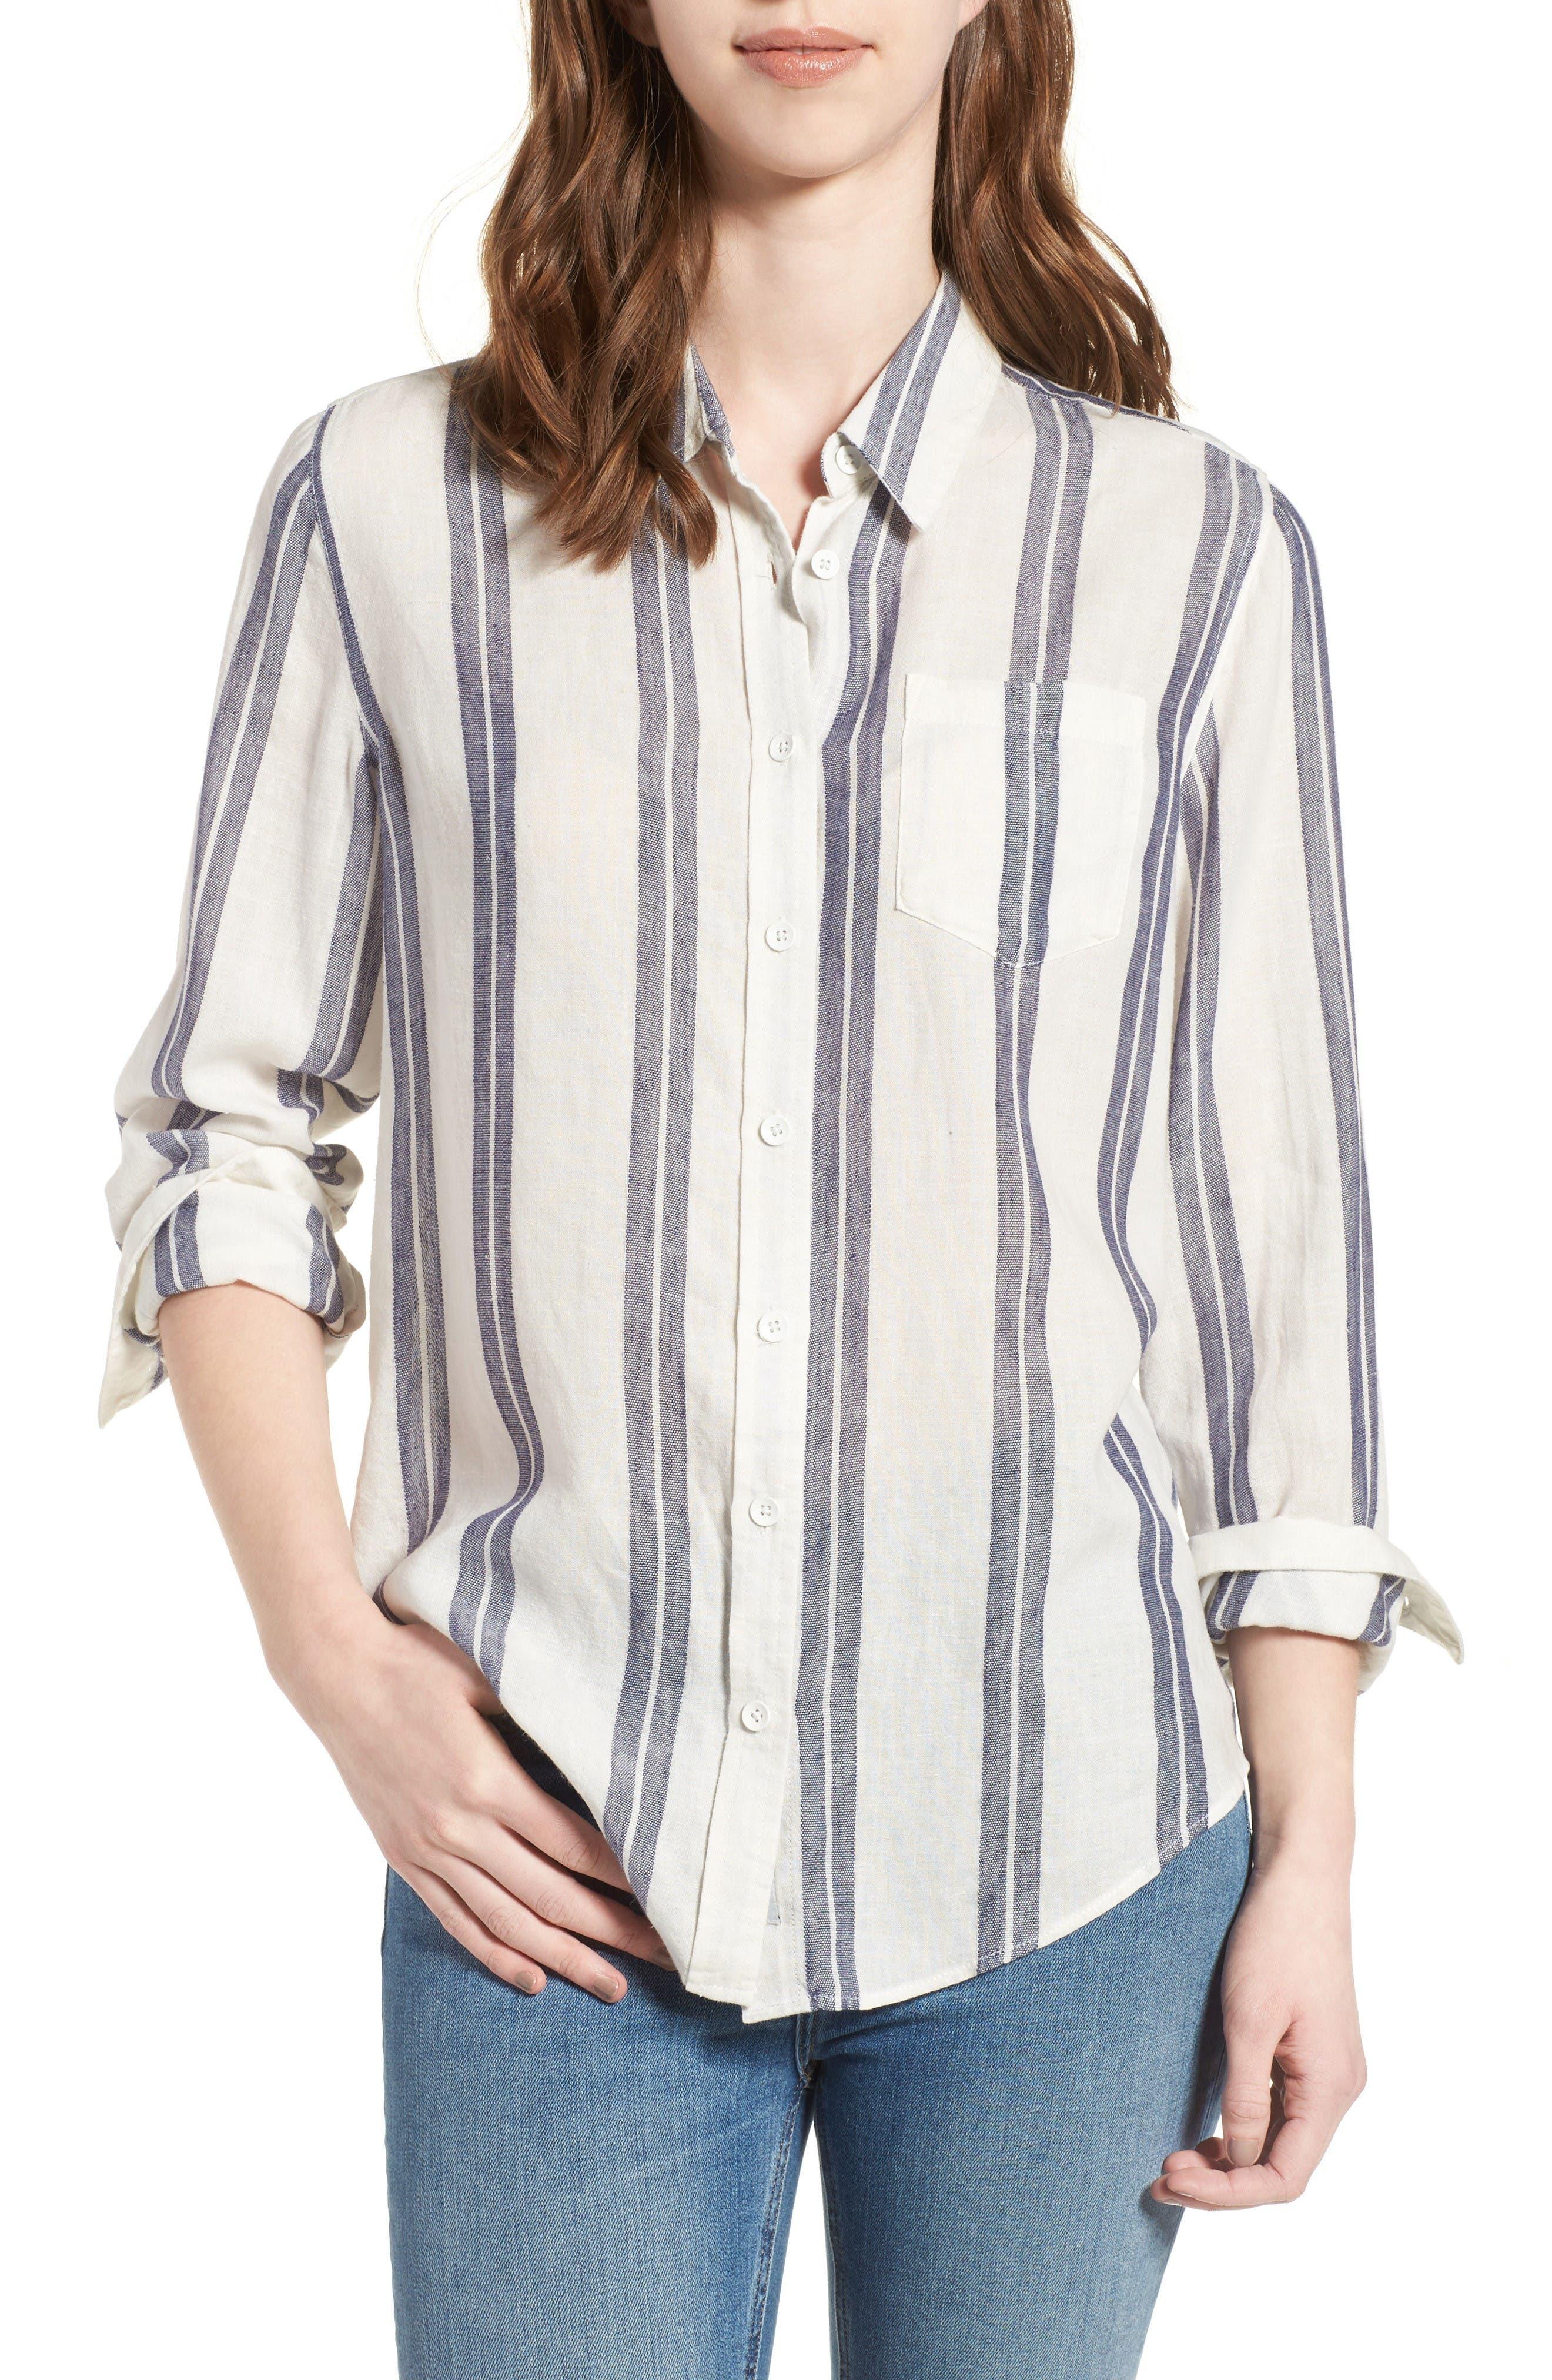 Alternate Image 1 Selected - DL1961 Mercer & Spring Shirt